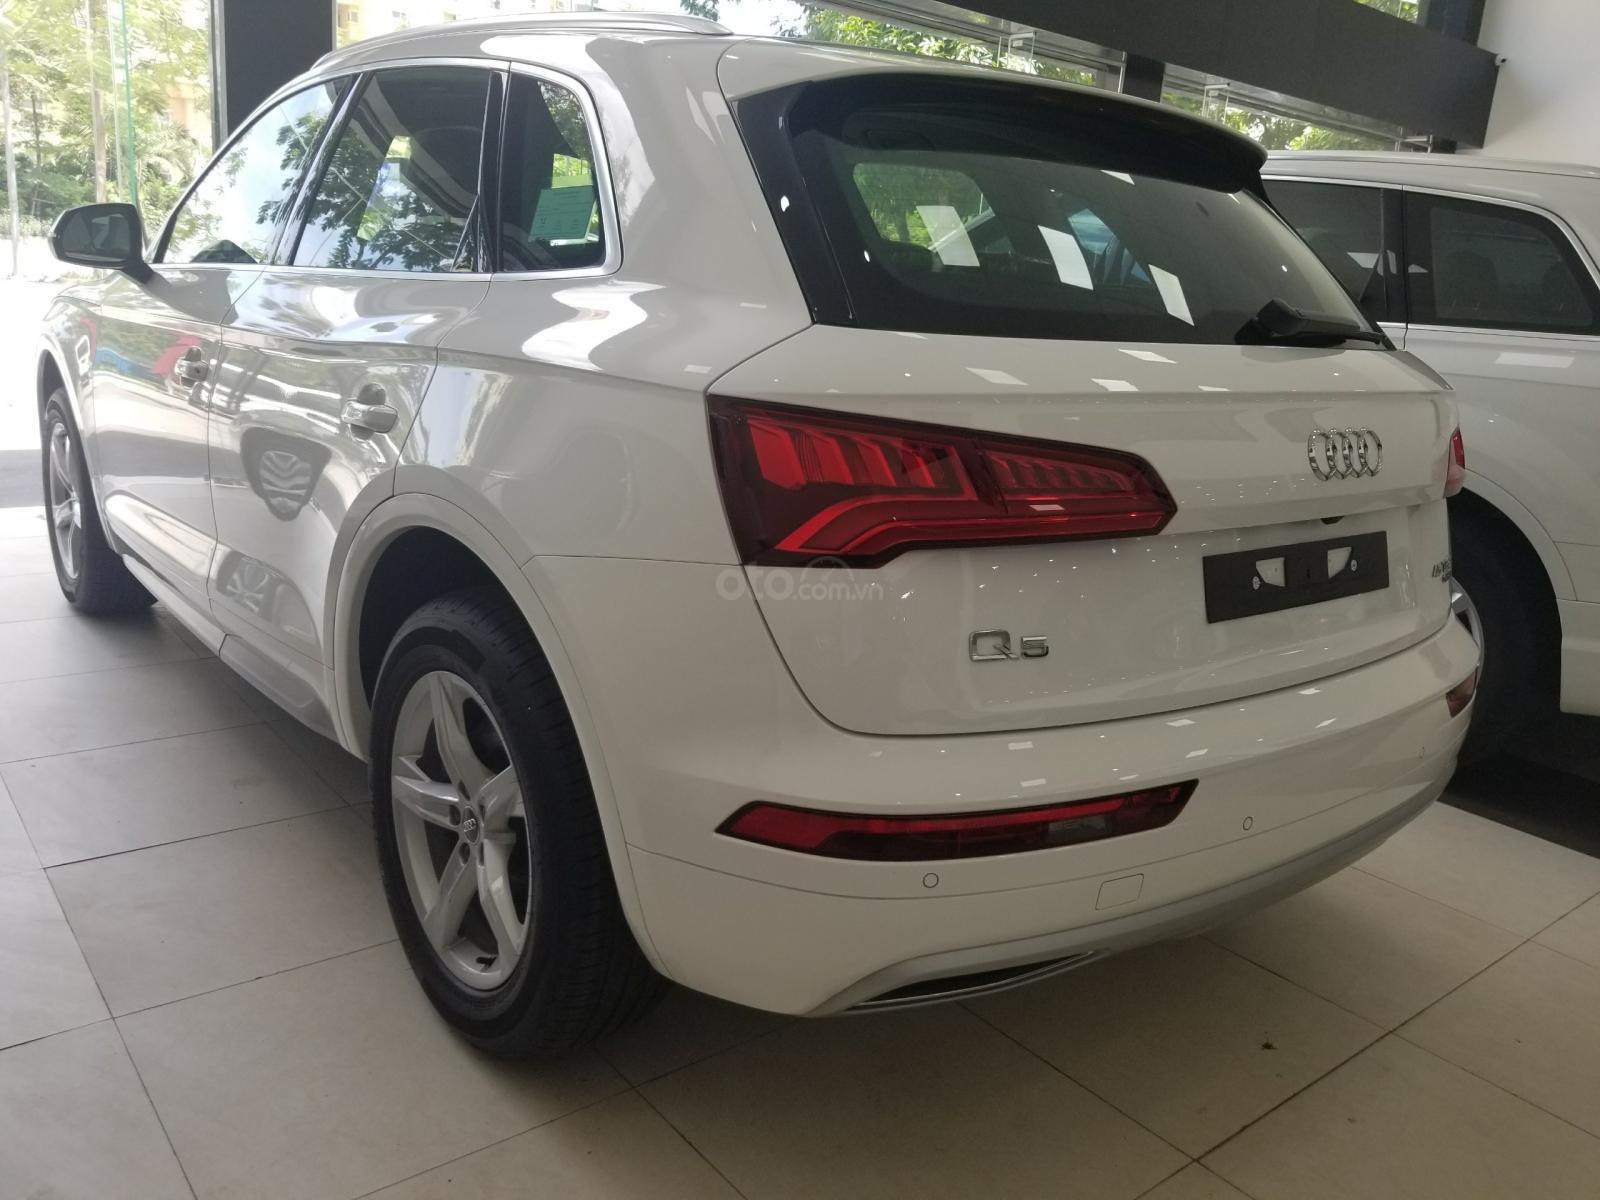 Tf1 Auto Cần Ban Xe Audi Q5 Sport đời 2020 Mau Trắng Gia Tốt